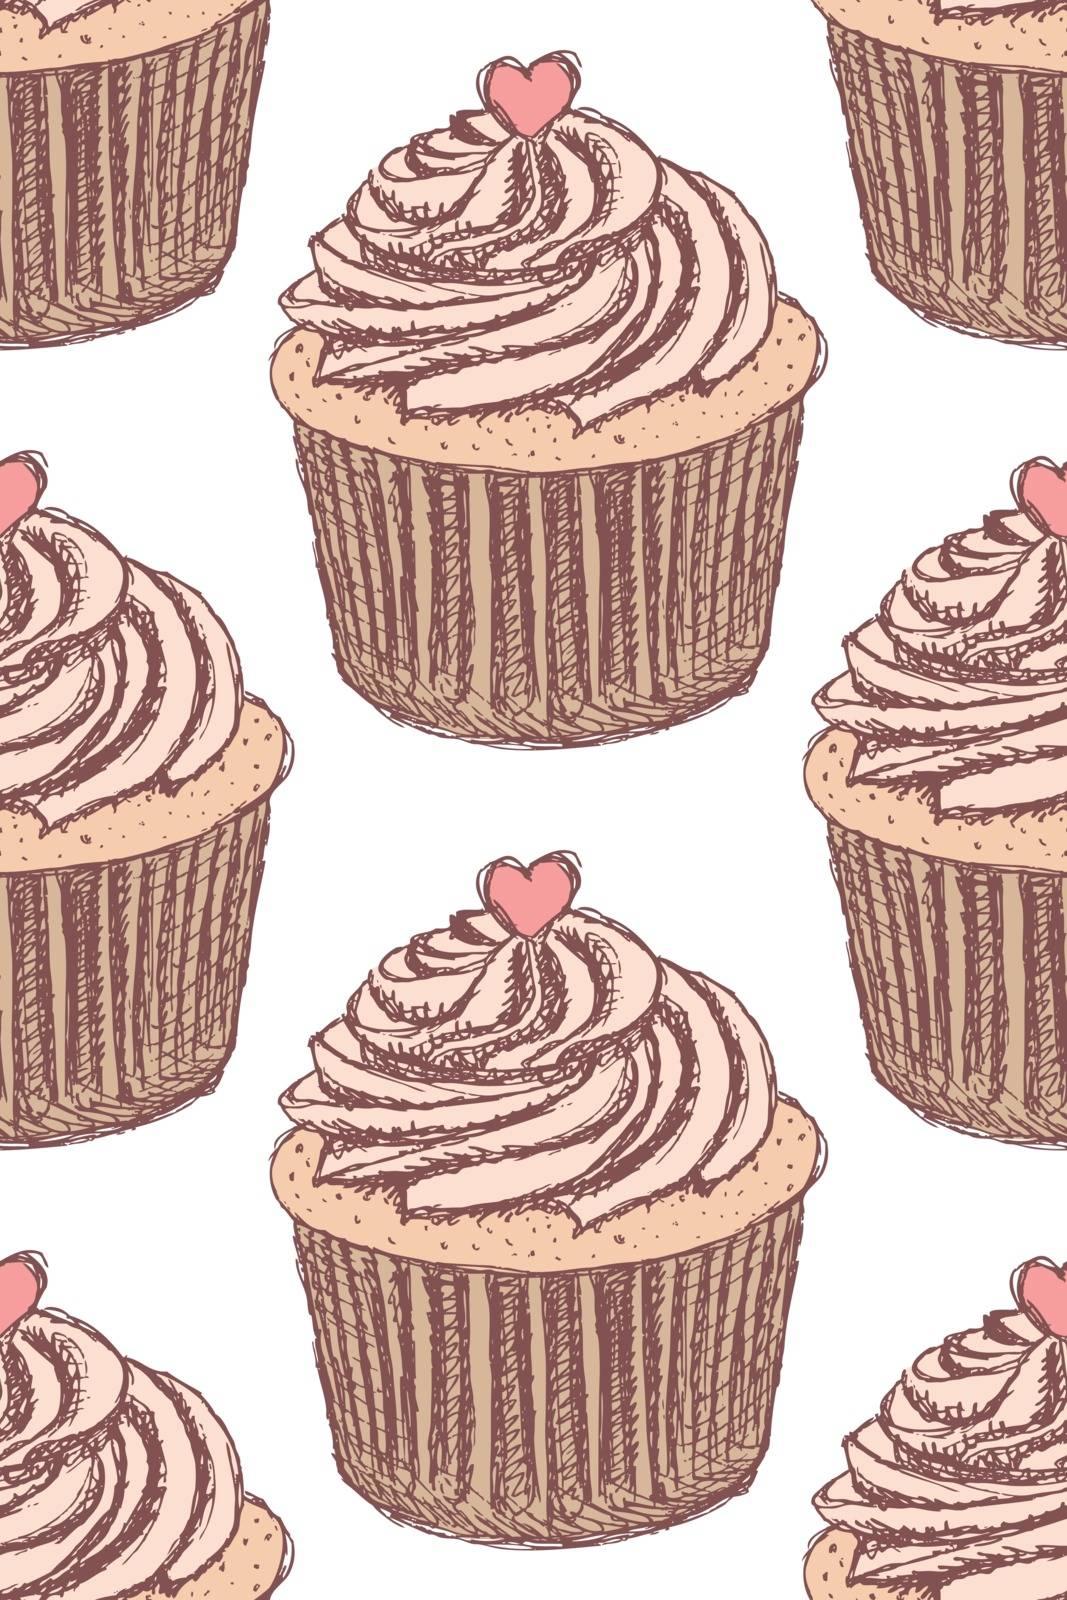 Sketch tasty cupcke in vintage style, vector seamless pattern